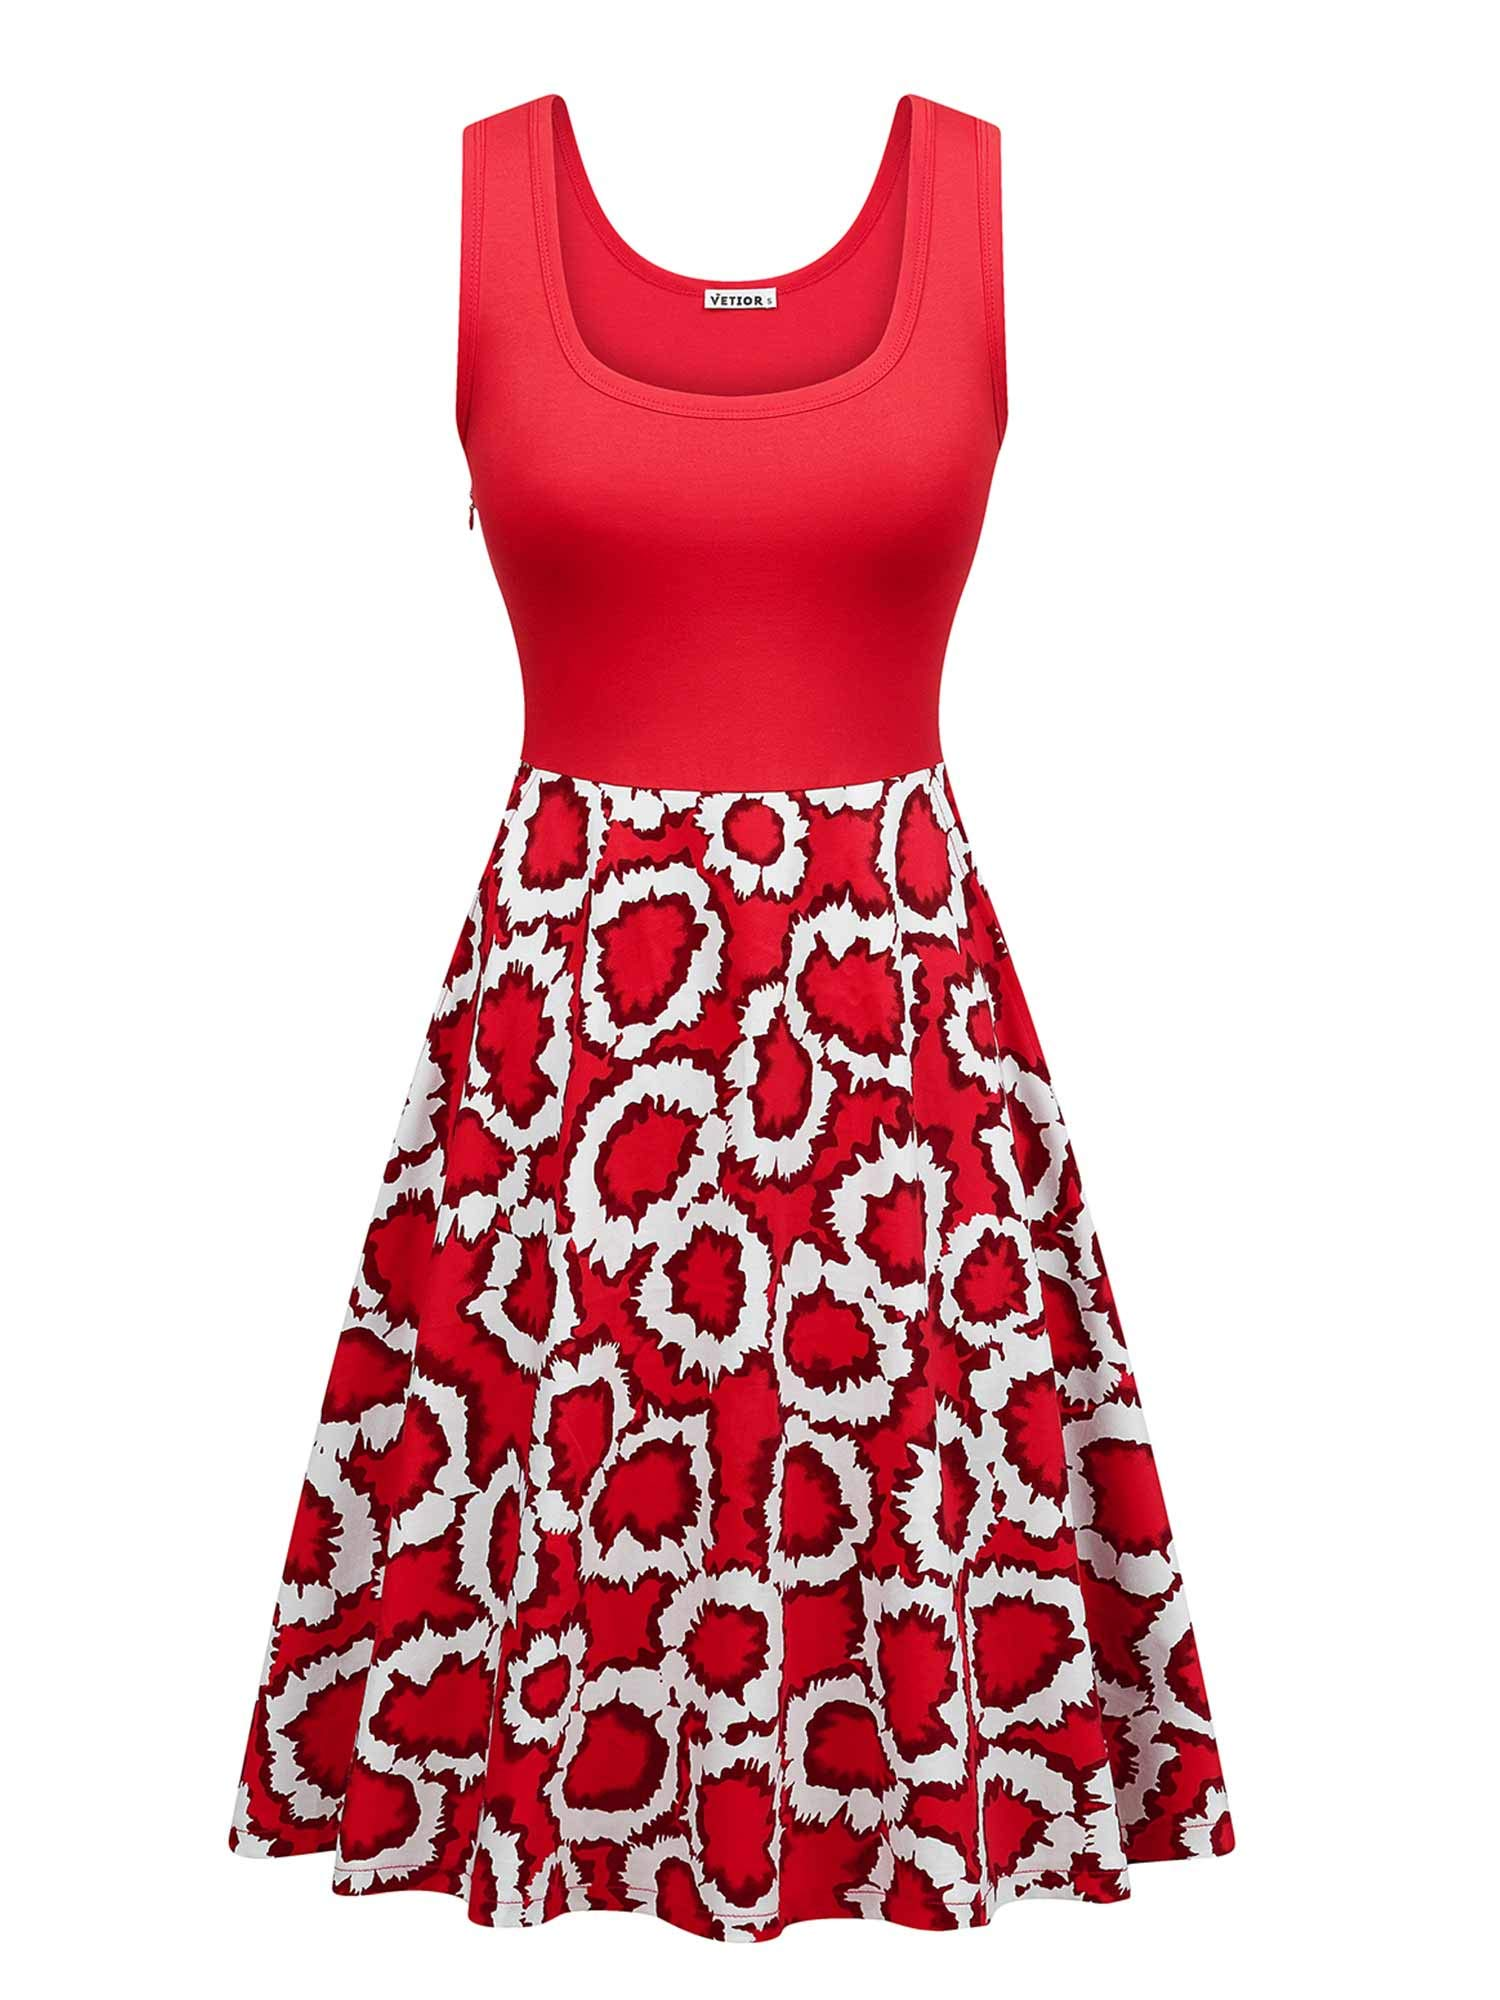 VETIOR Womens Vintage Scoop Neck Midi Dress Sleeveless A-line Cocktail Party Tank Dress